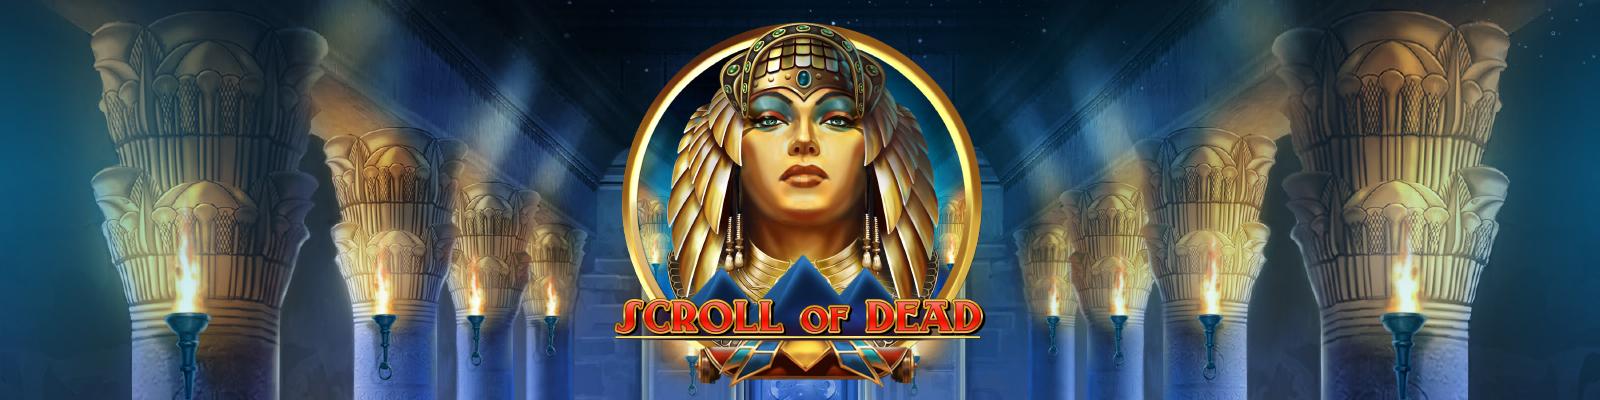 Scroll of Dead – Play'n GO